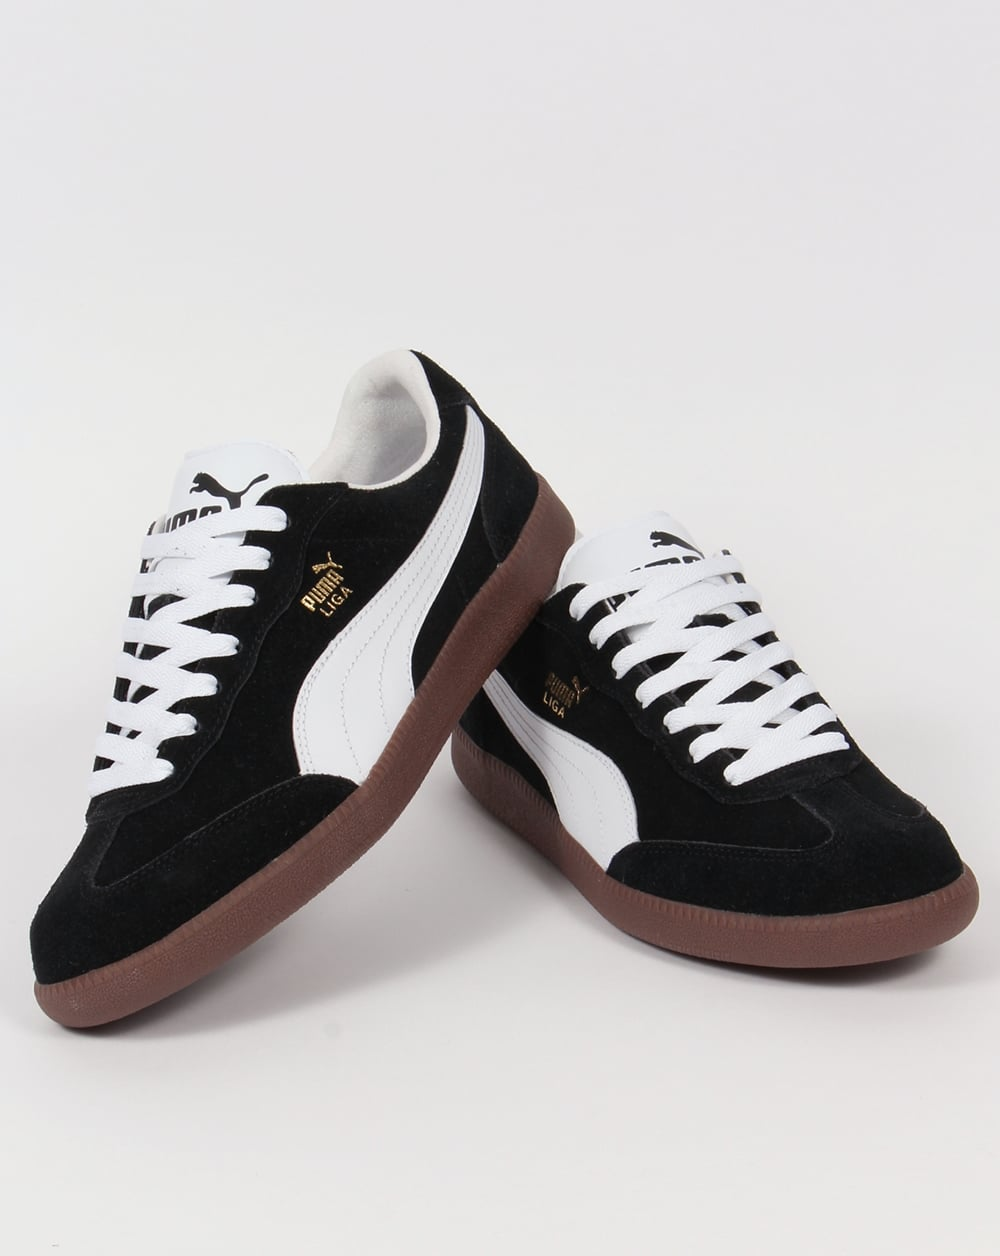 size 40 6abd8 4cf69 Puma Liga Suede Trainers Black/White